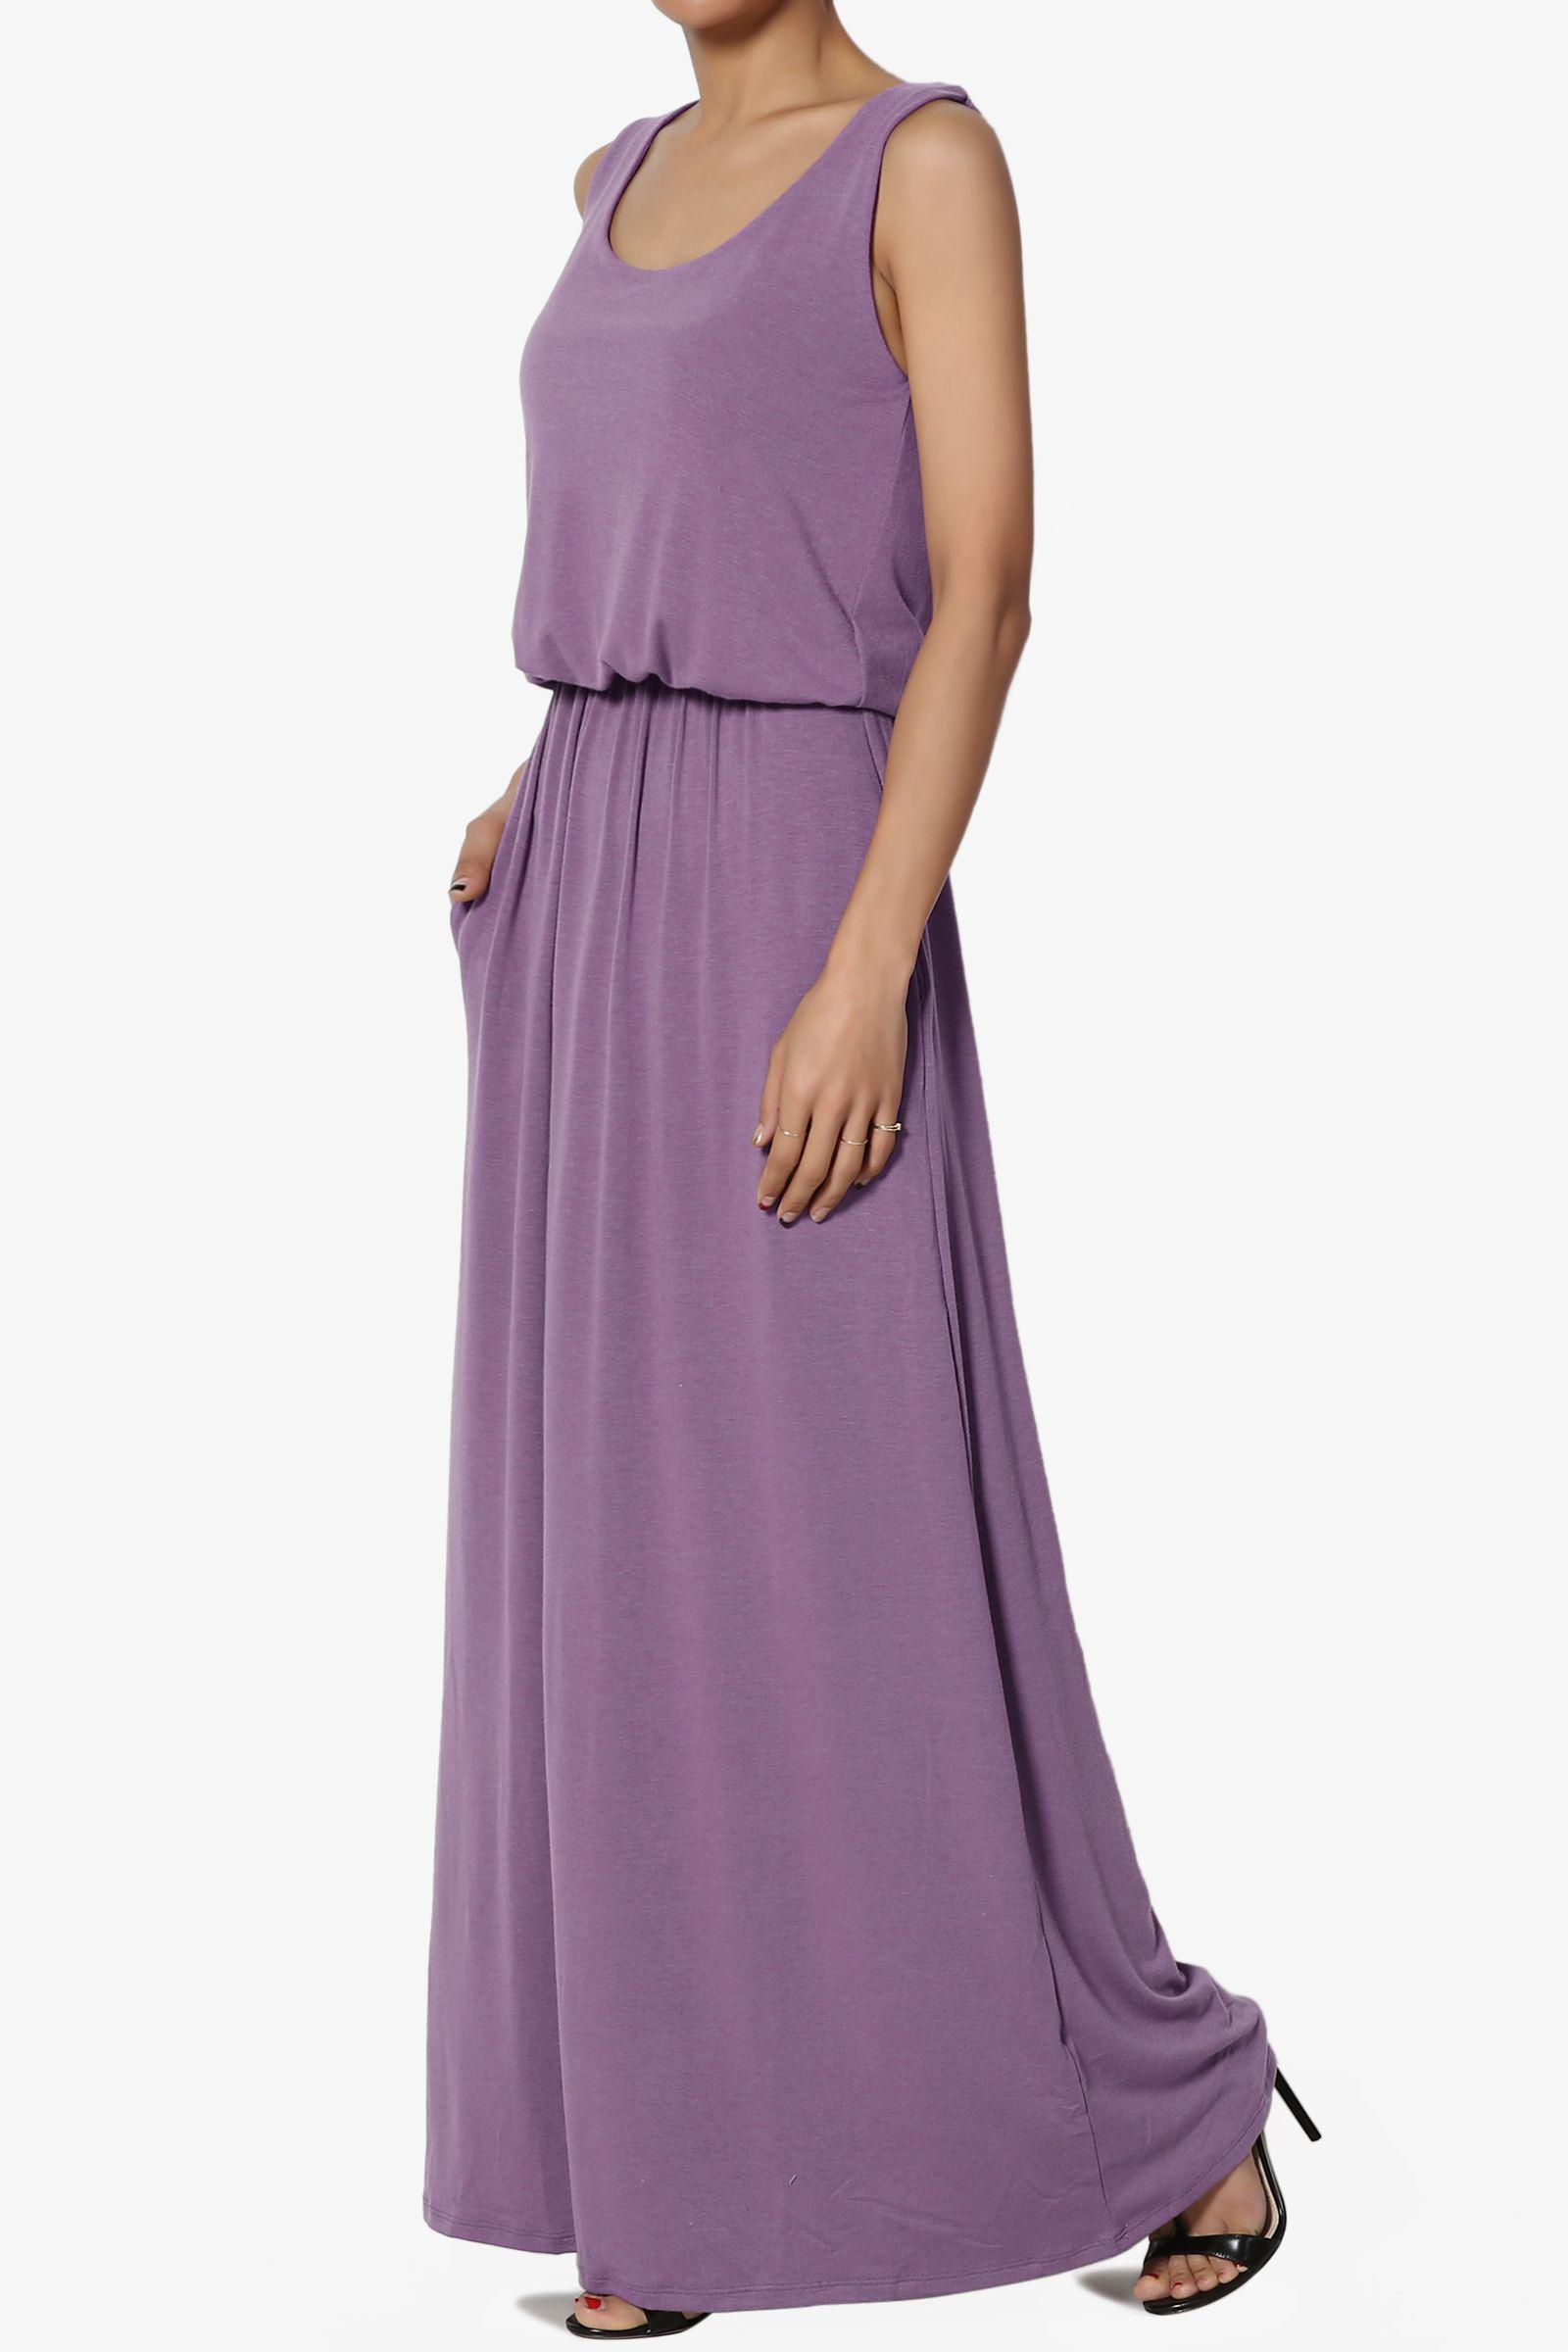 Themogan Themogan Women S S 3x Sleeveless Scoop Neck Blouson Tank Top Long Skirt Maxi Dress Walmart Com Maxi Dress Dresses Long Skirt [ 2400 x 1600 Pixel ]